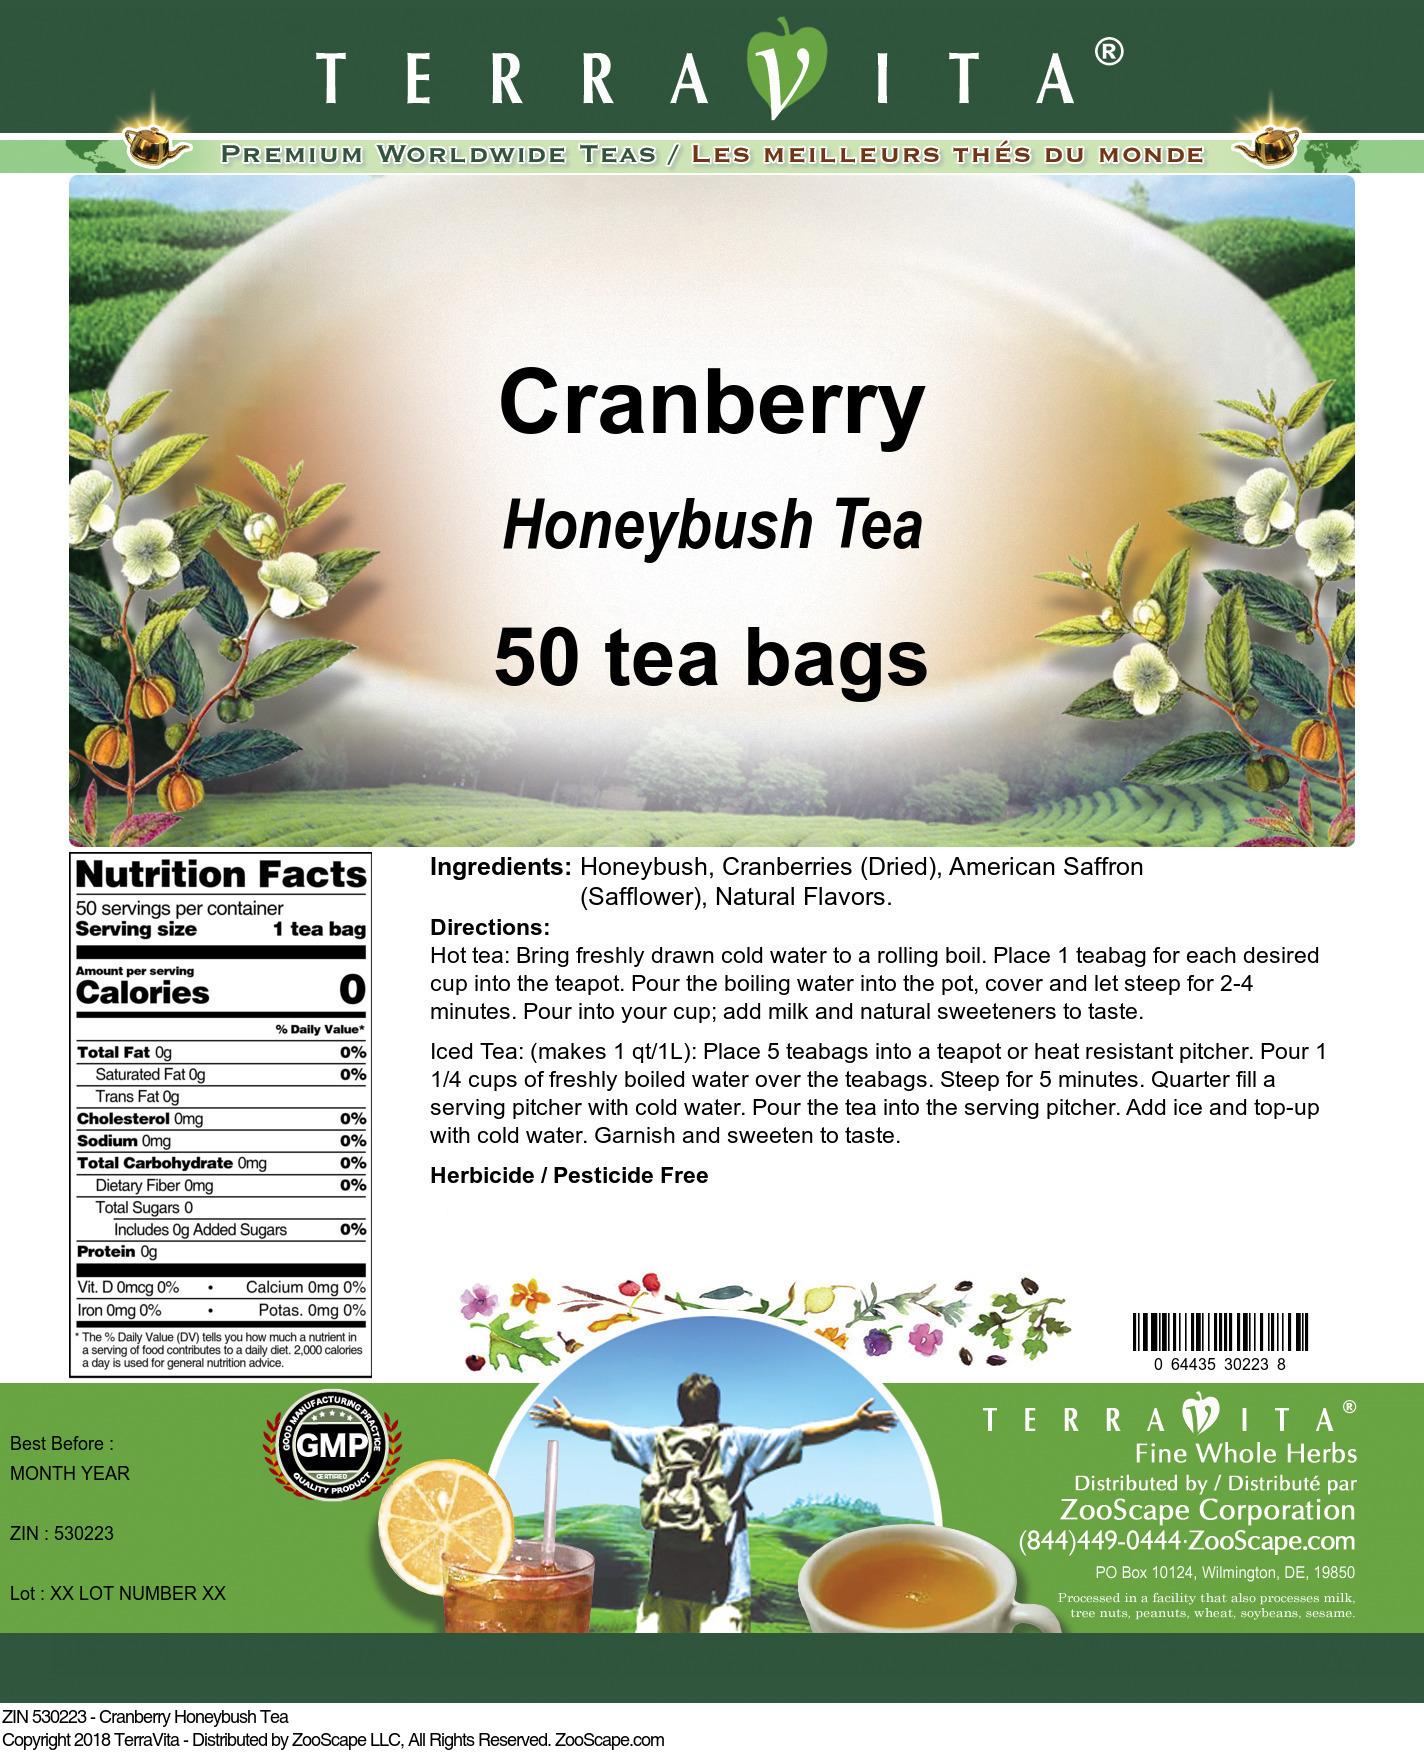 Cranberry Honeybush Tea